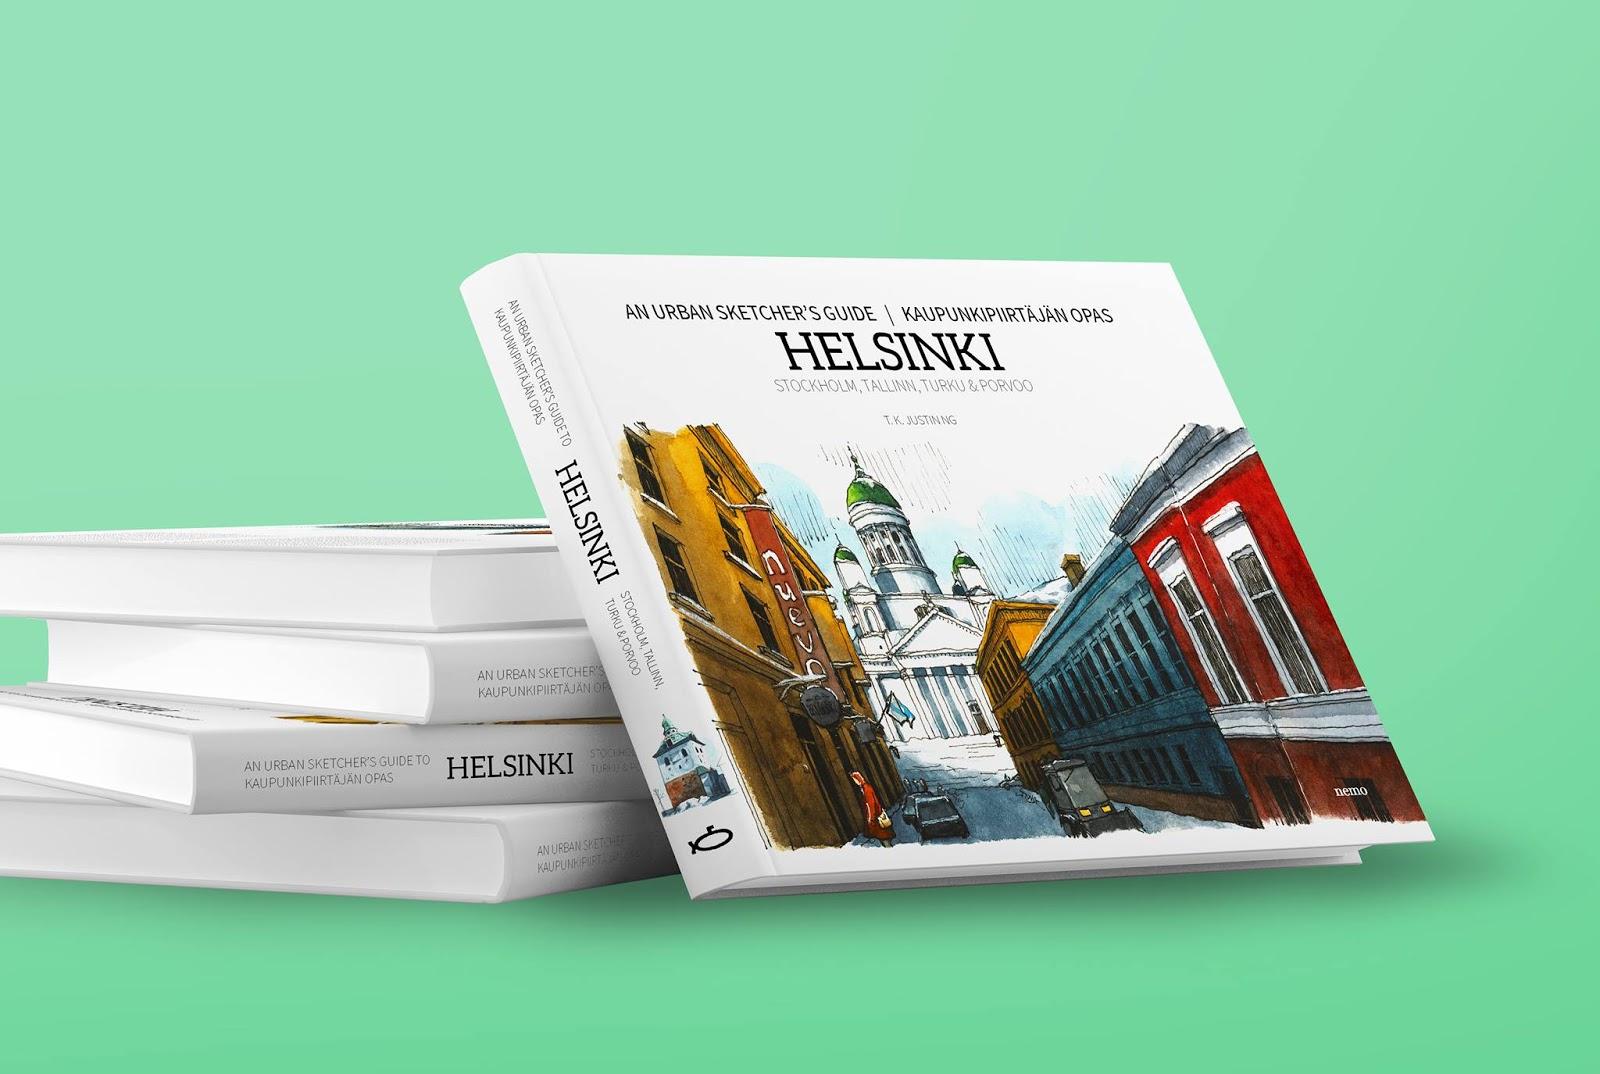 Internship In Helsinki Leads To Sketching Adventure Book Deal